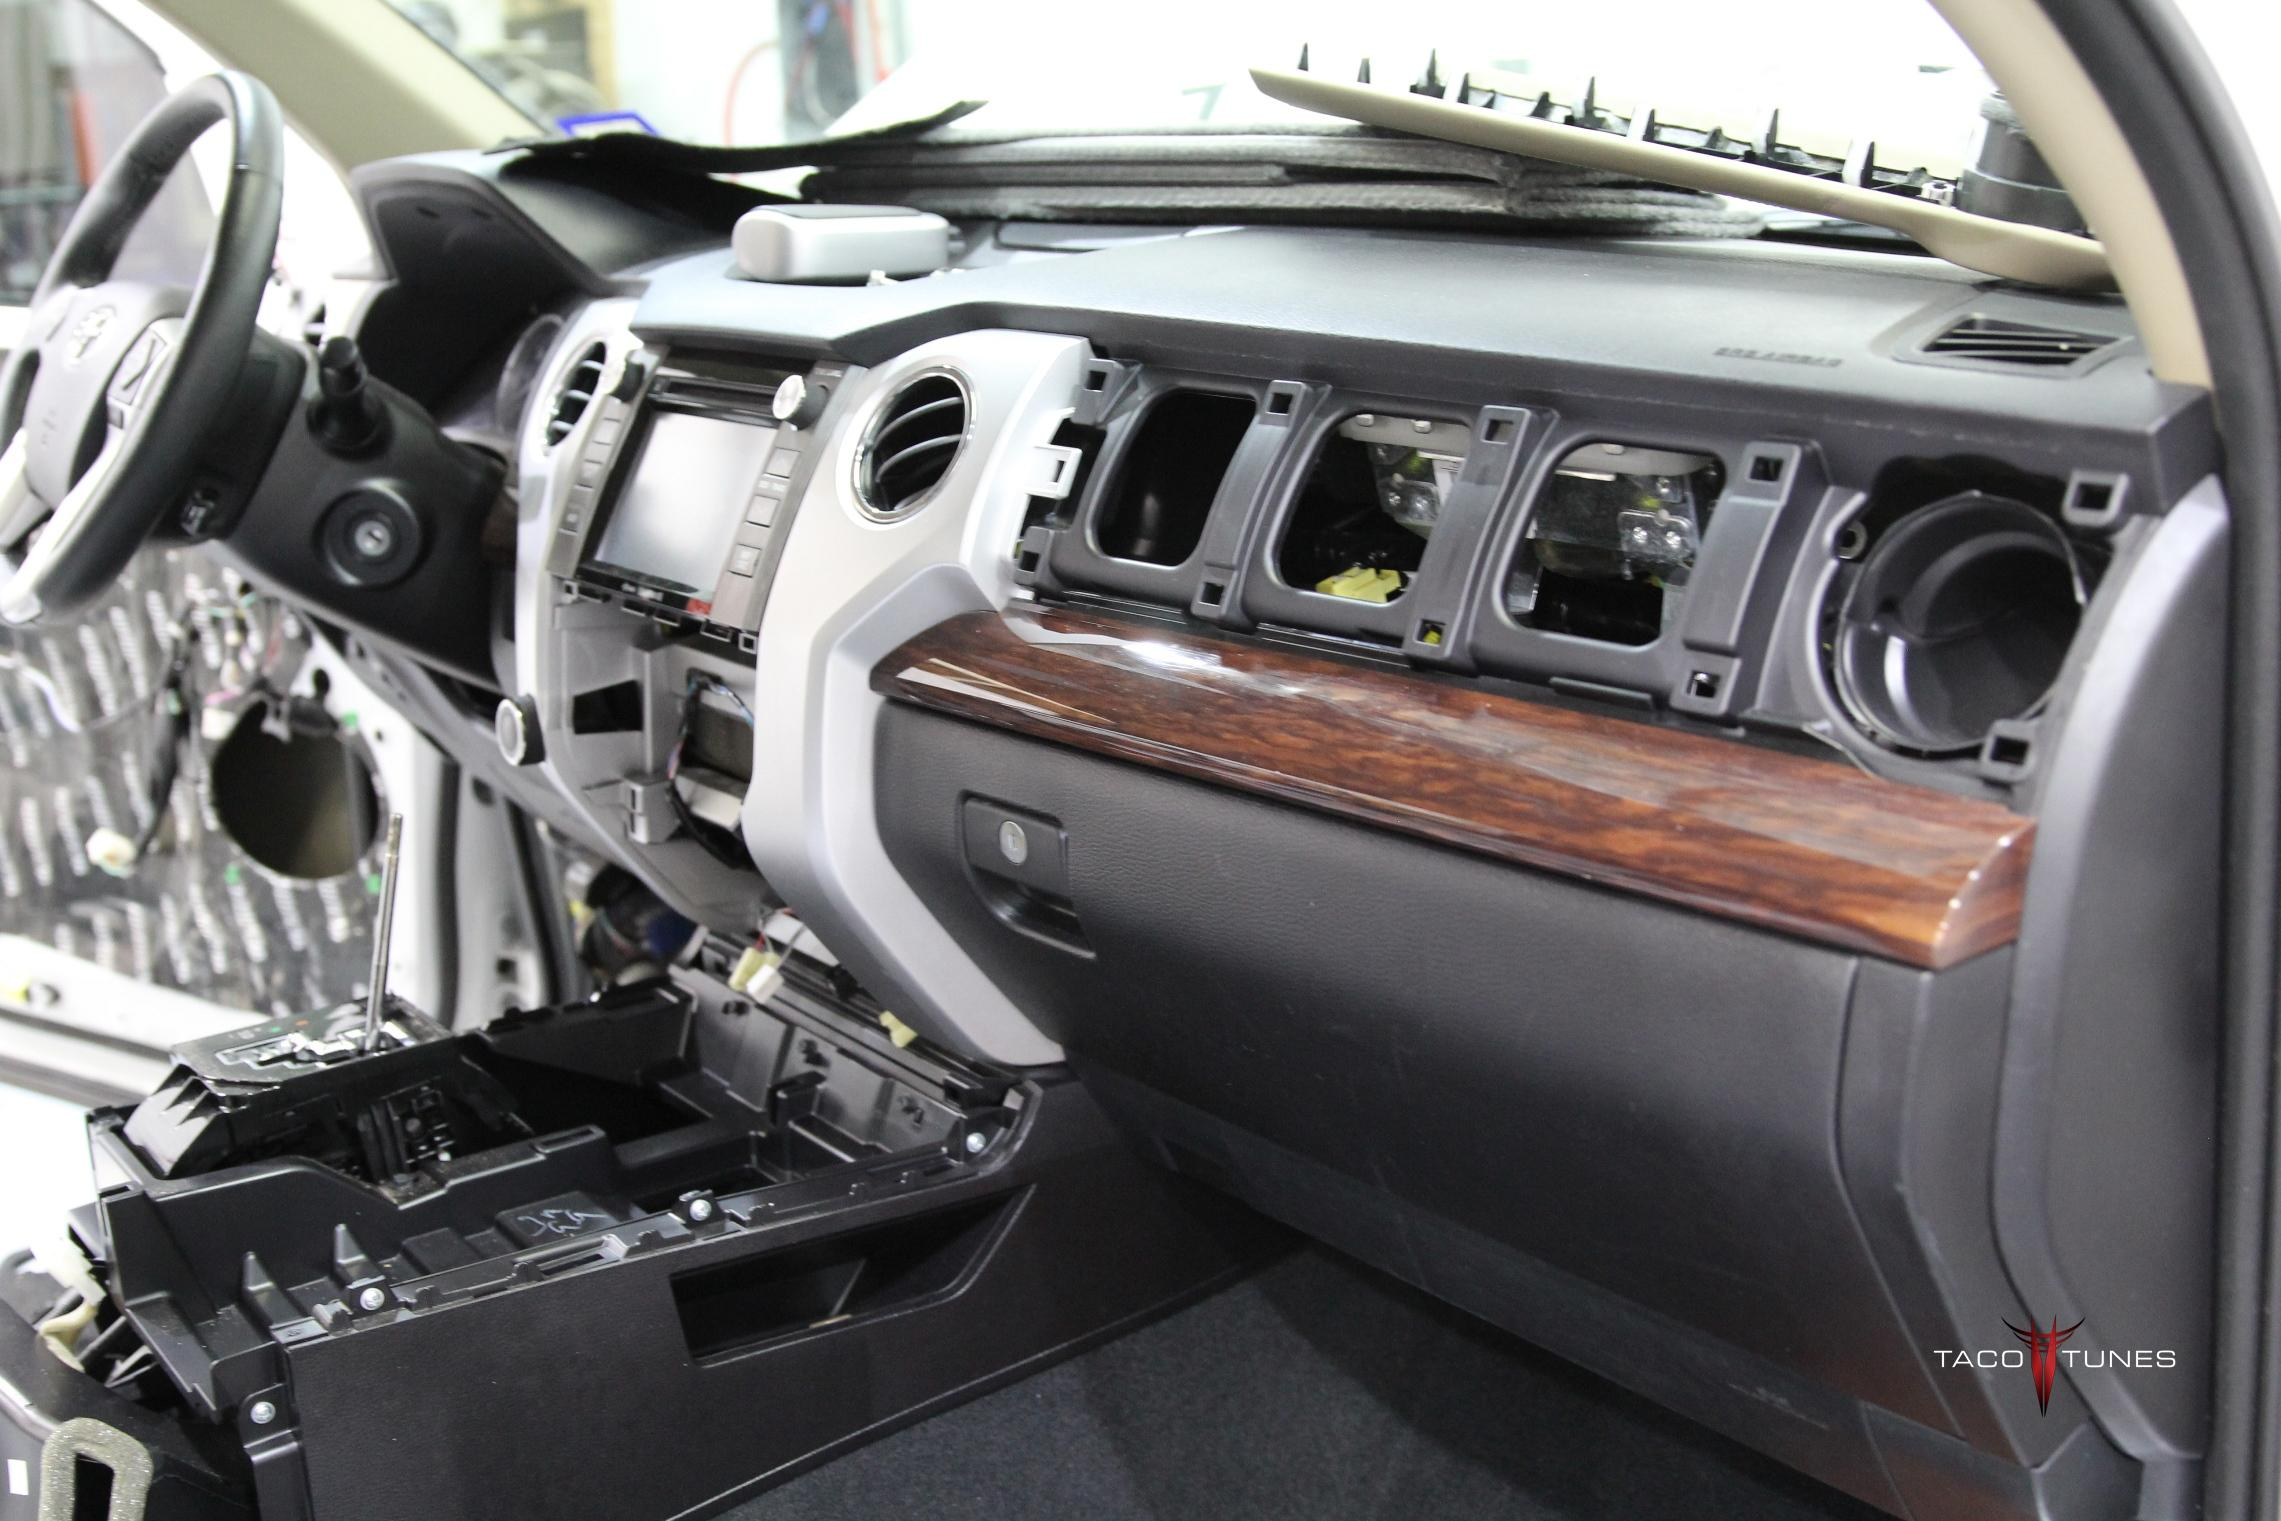 jons 2015 toyota tundra crewmax limited audio system upgrade austin tx 21 taco tunes. Black Bedroom Furniture Sets. Home Design Ideas